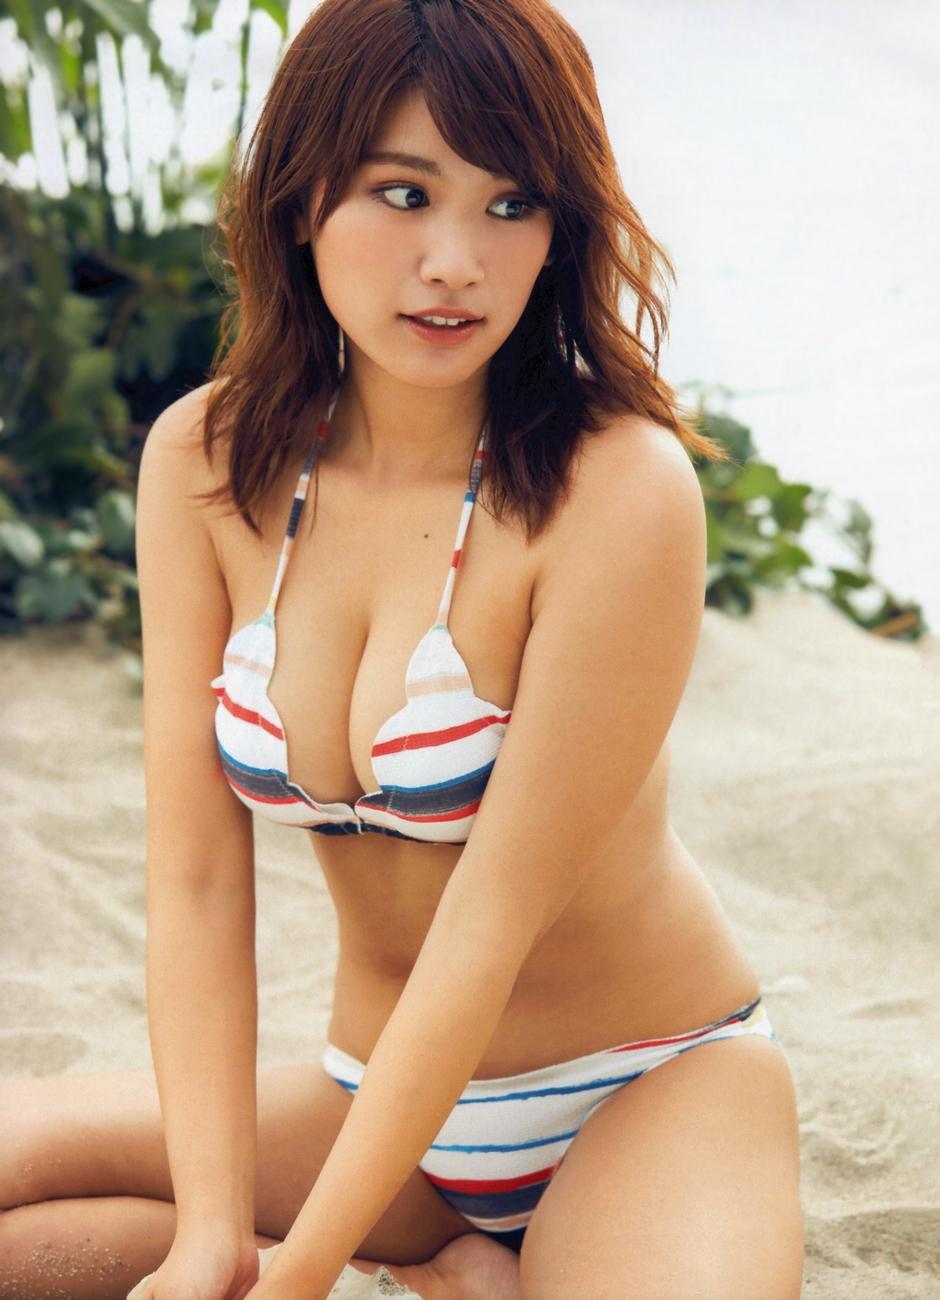 hisamatsu_ikumi229.jpg